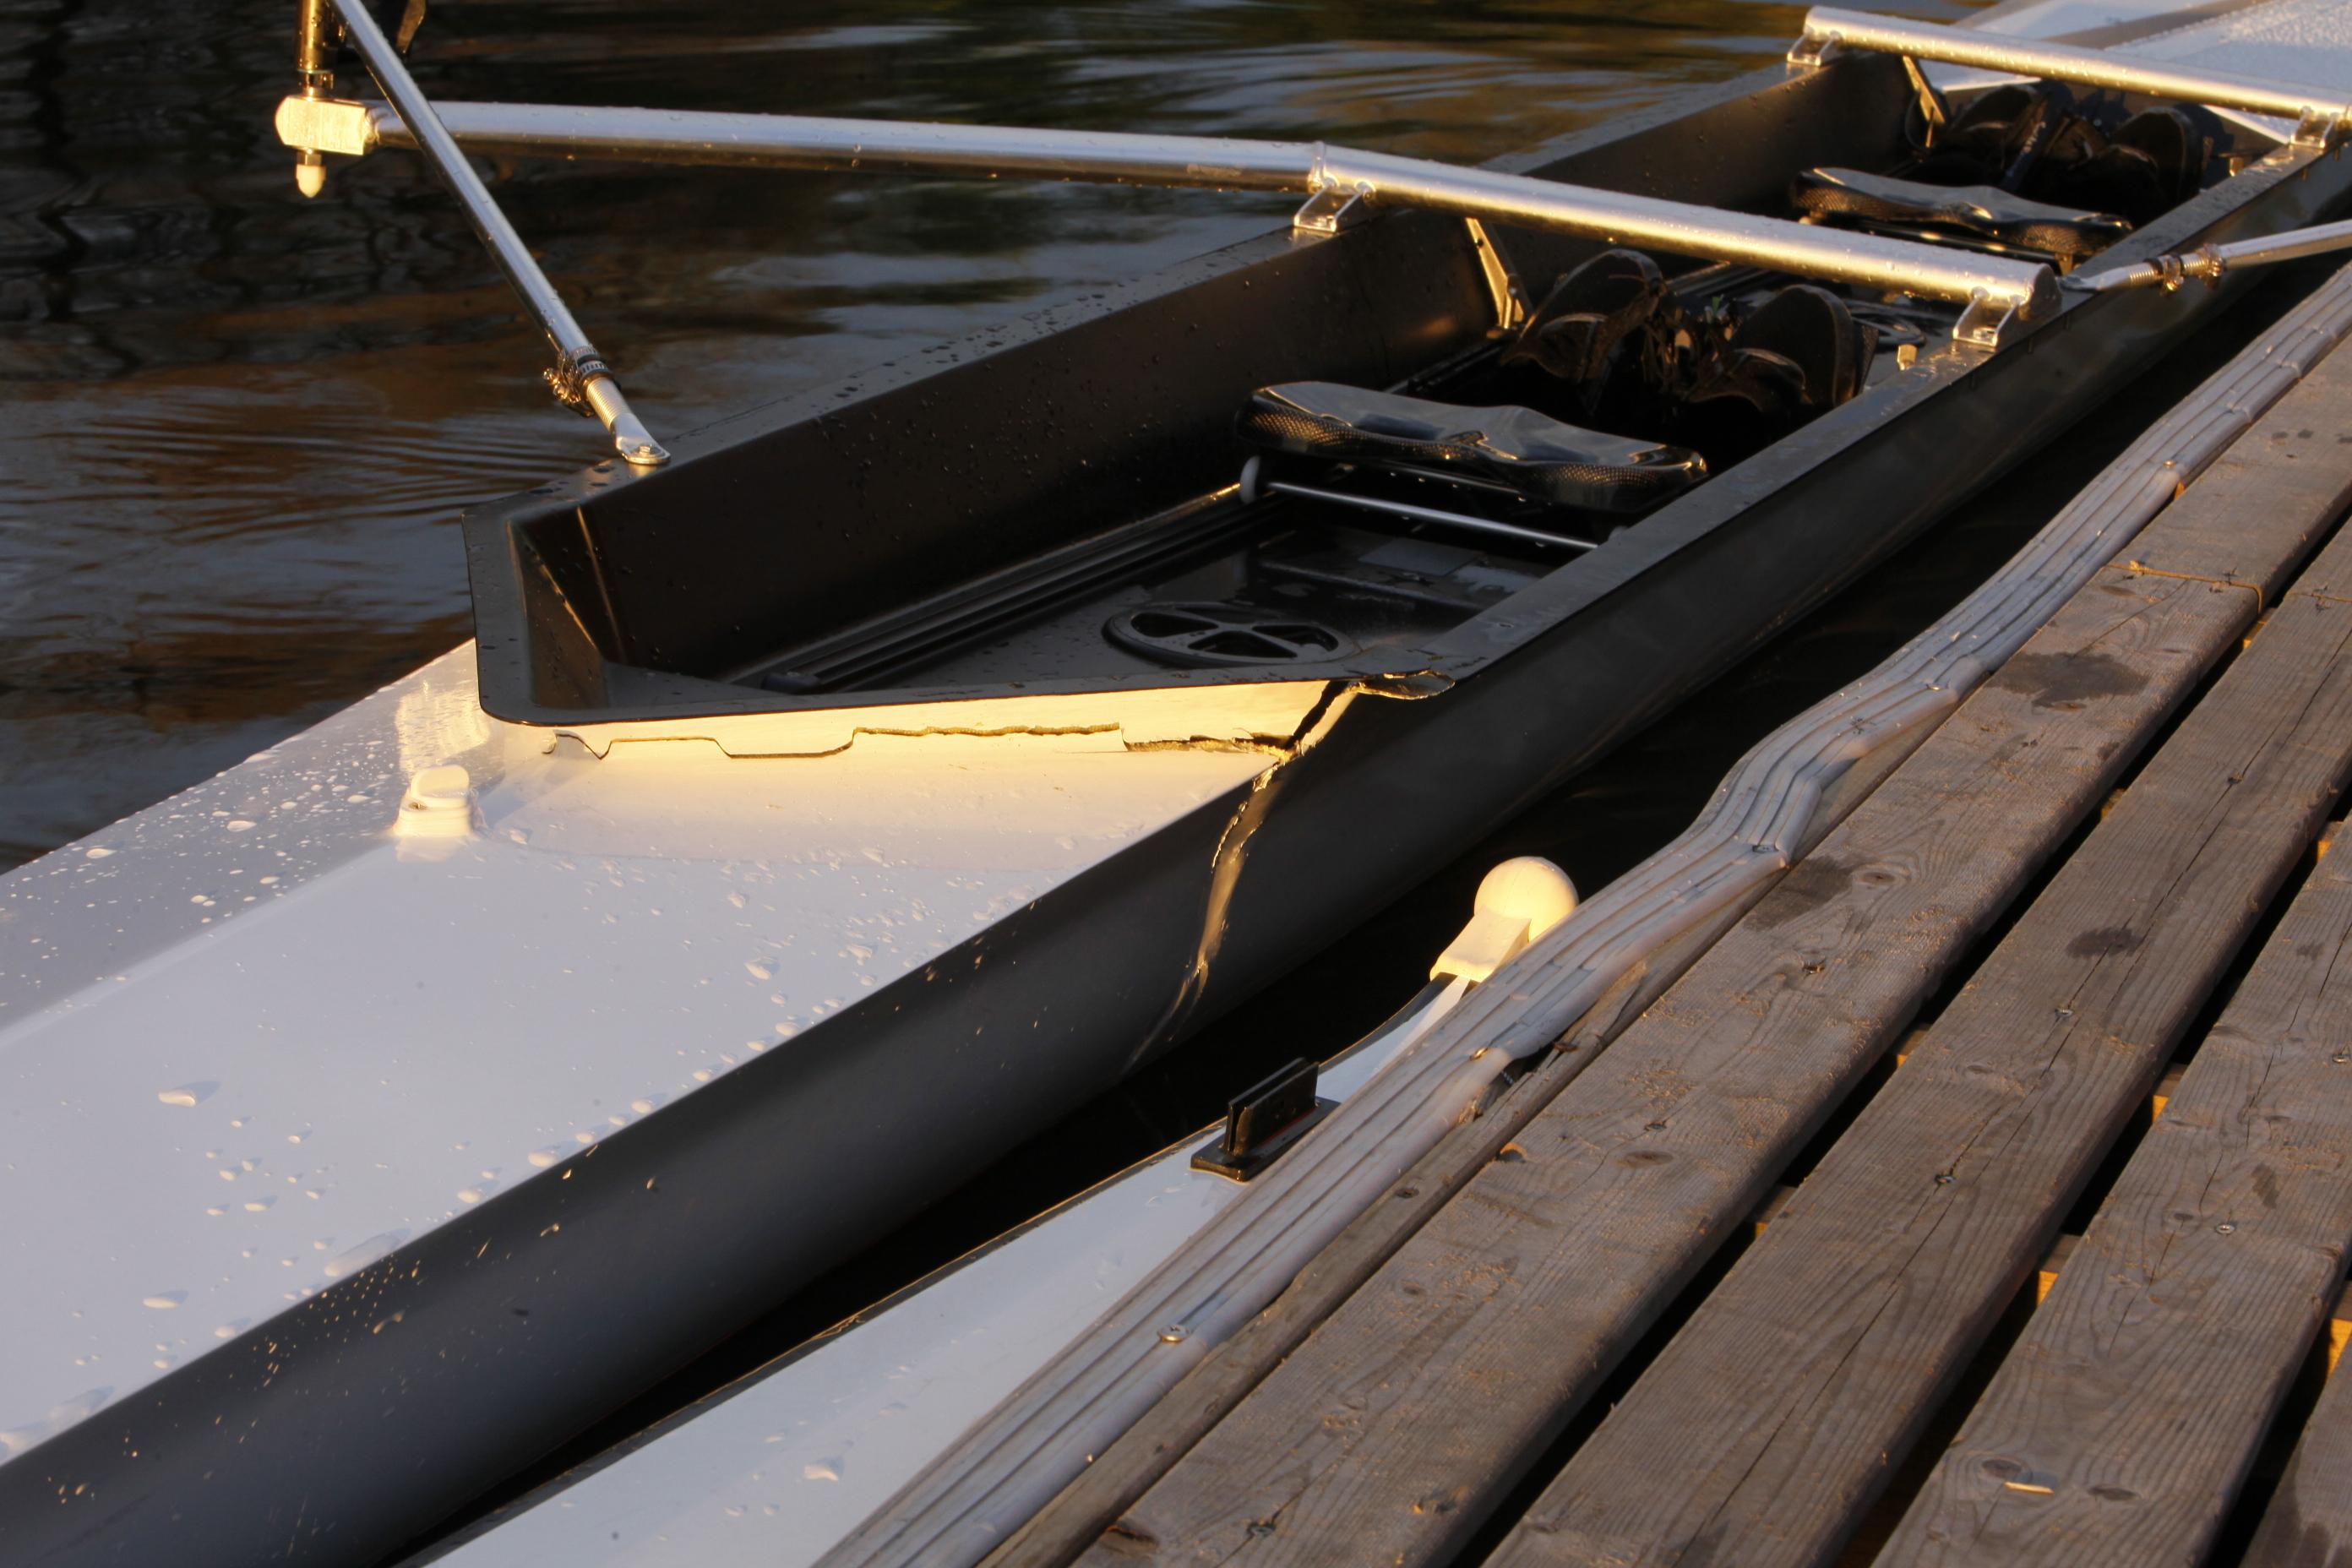 заказать гребную лодку